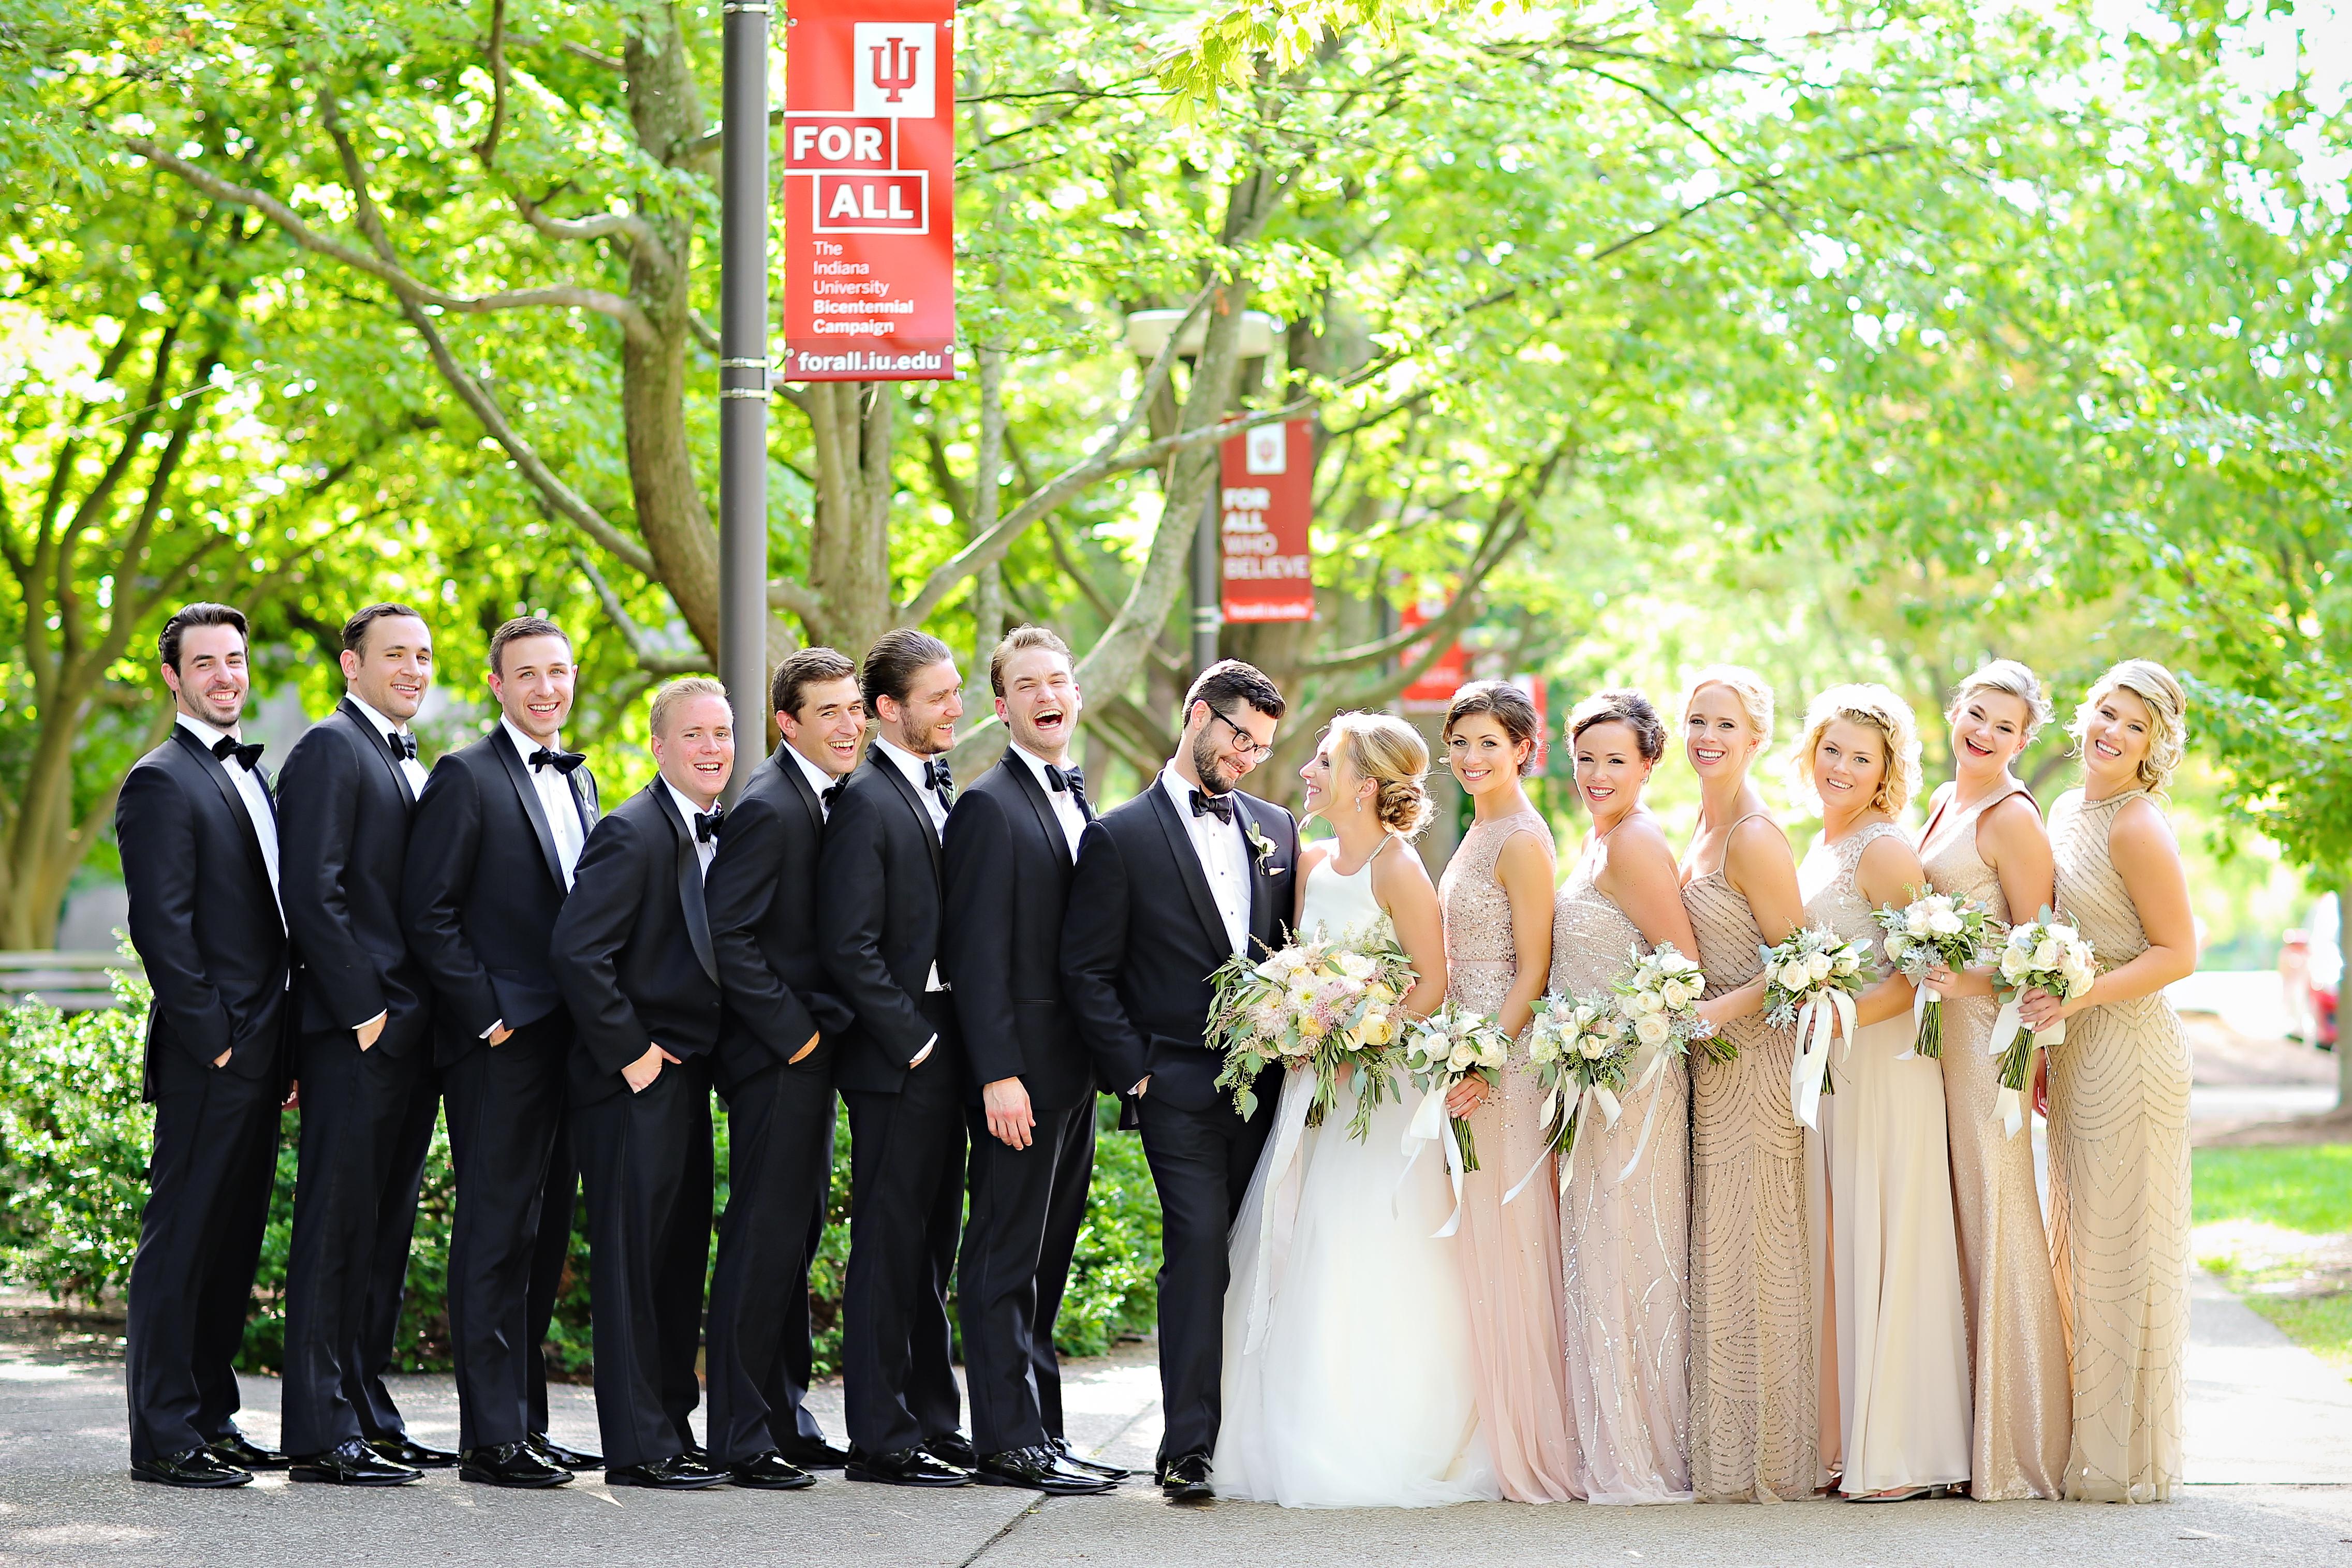 207 meaghan matt indiana university wedding